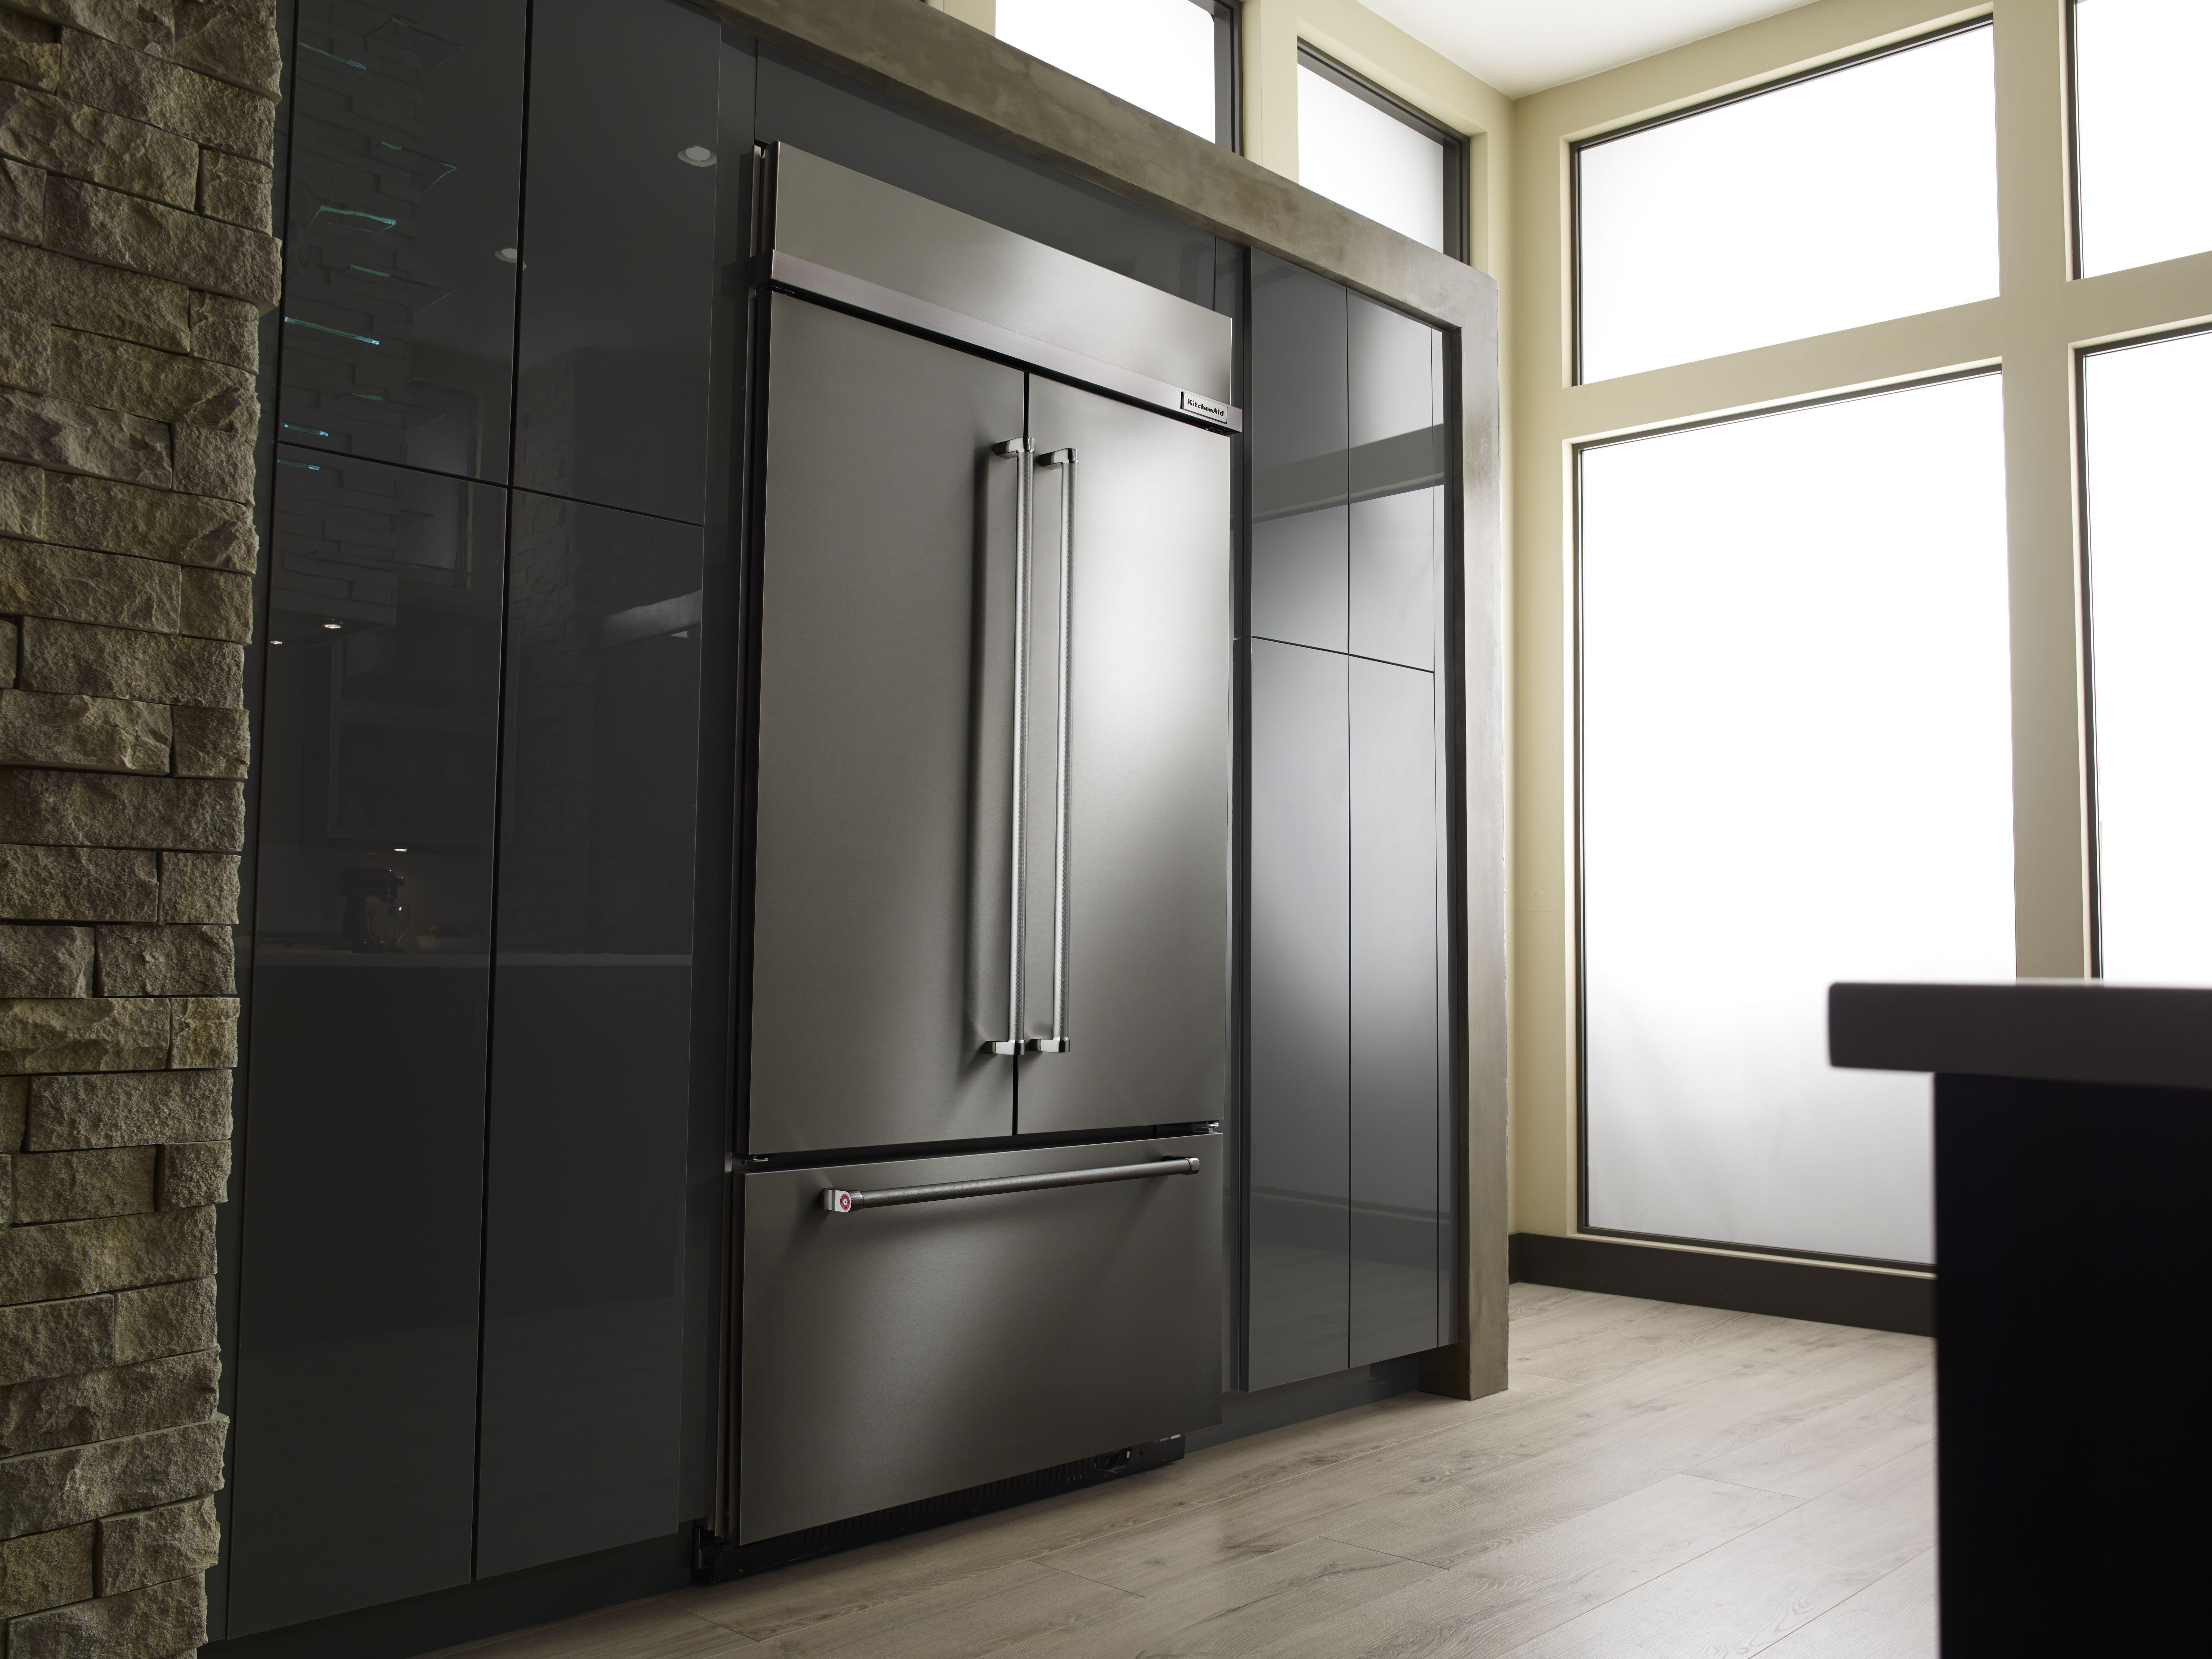 KitchenAid® 25 3 Cu  Ft  Built In French Door Refrigerator